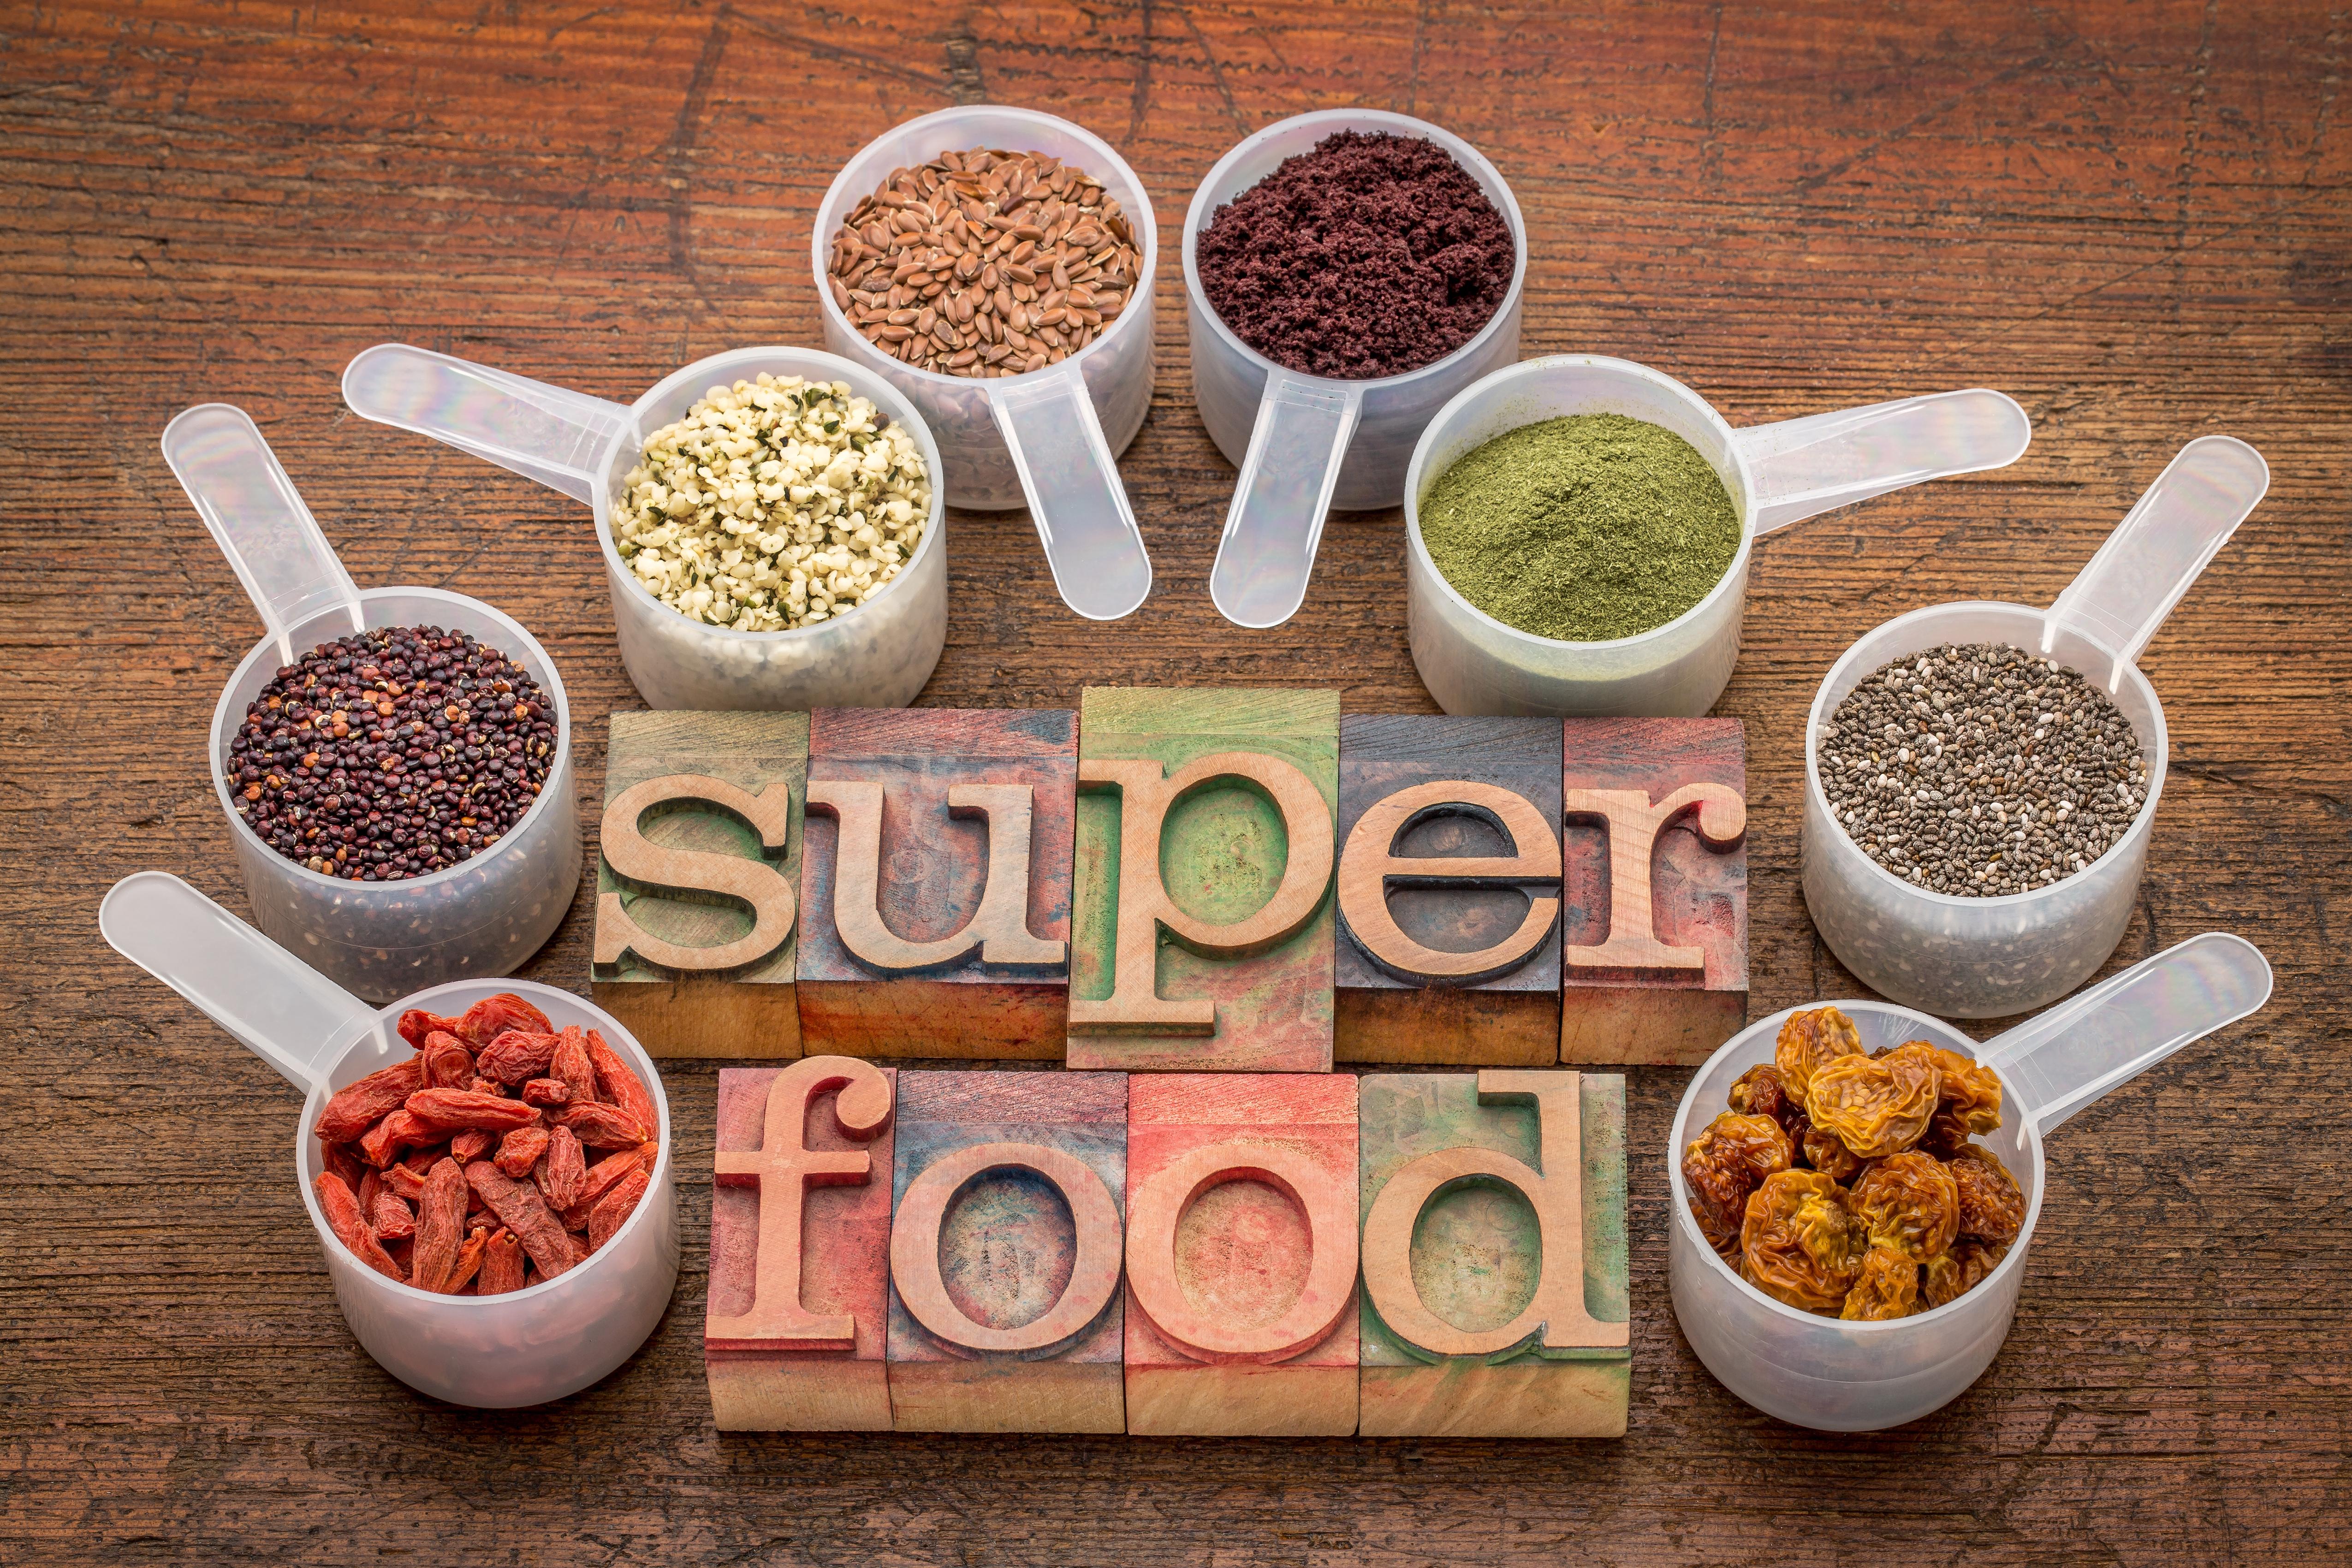 bigstock-superfood-abstract-wheatgrass-95462738